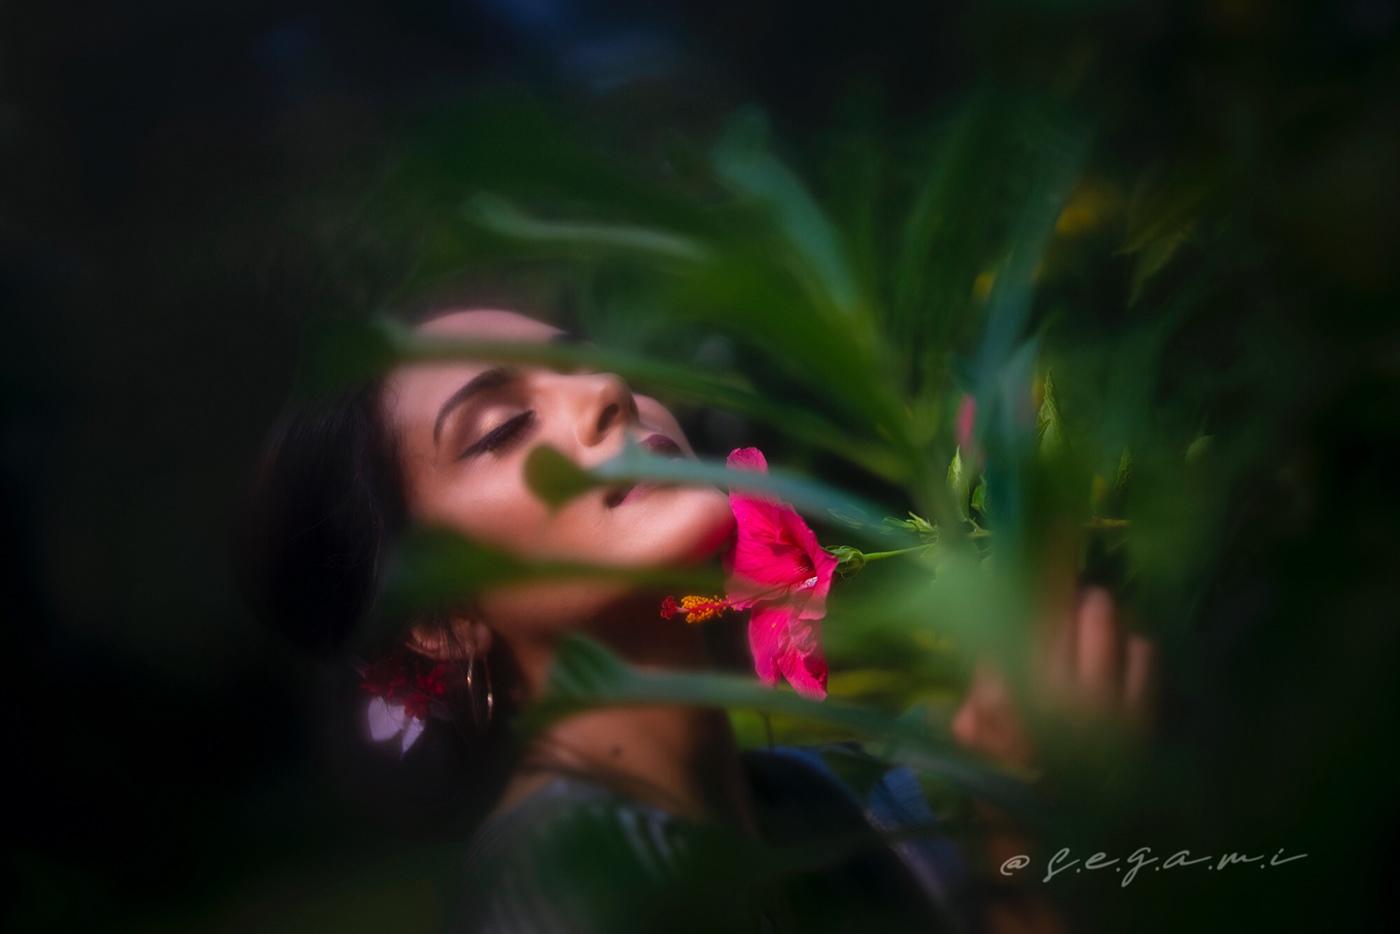 actor,beauty,Bollywood,Female Model,flower,hairstle,India,MUMBAI,Retro